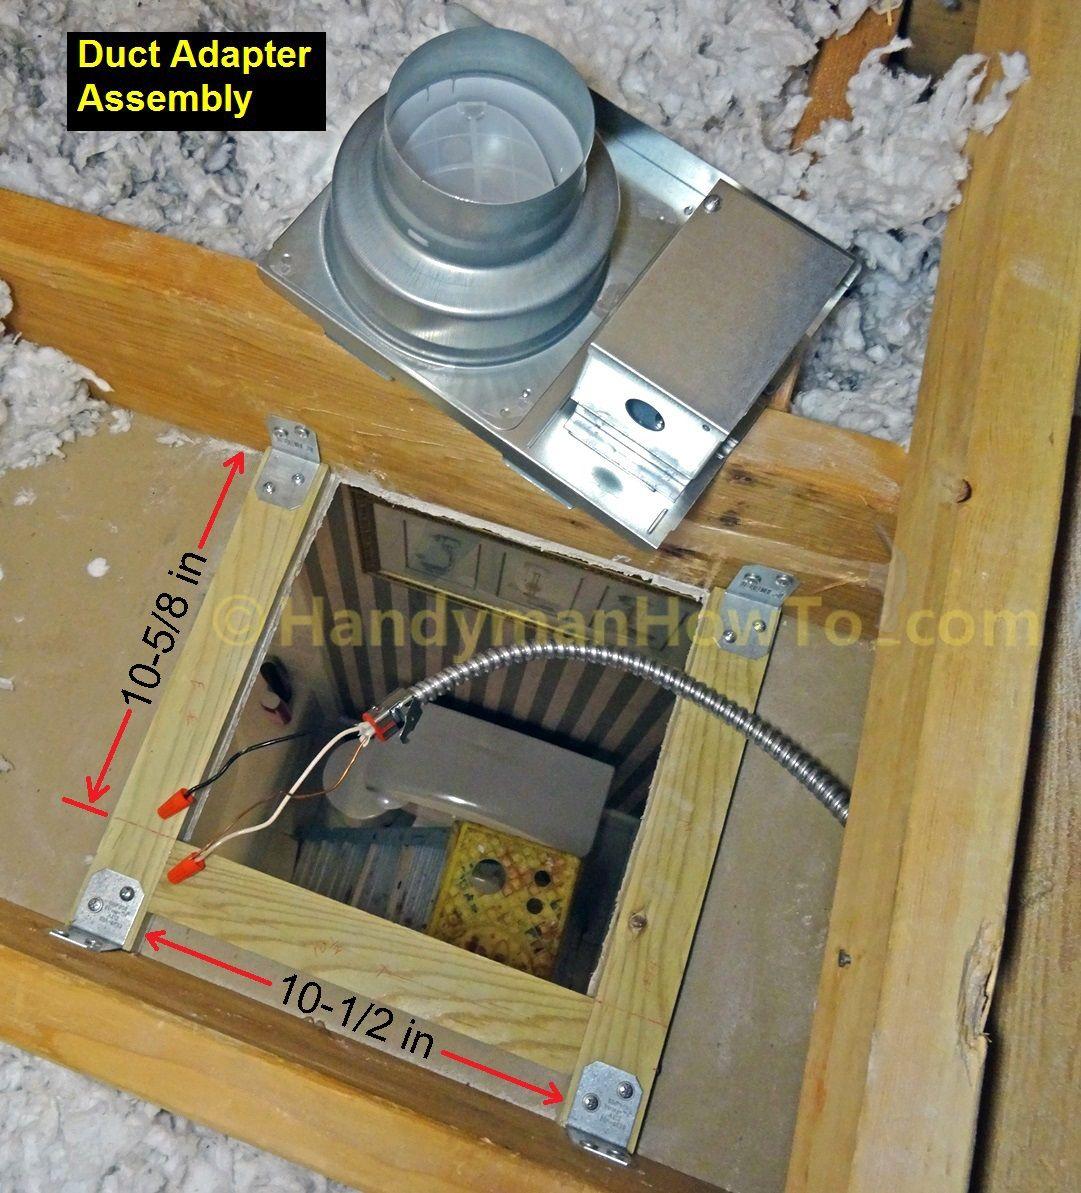 Panasonic Whisperceiling Bathroom Fan Wiring And Mounting